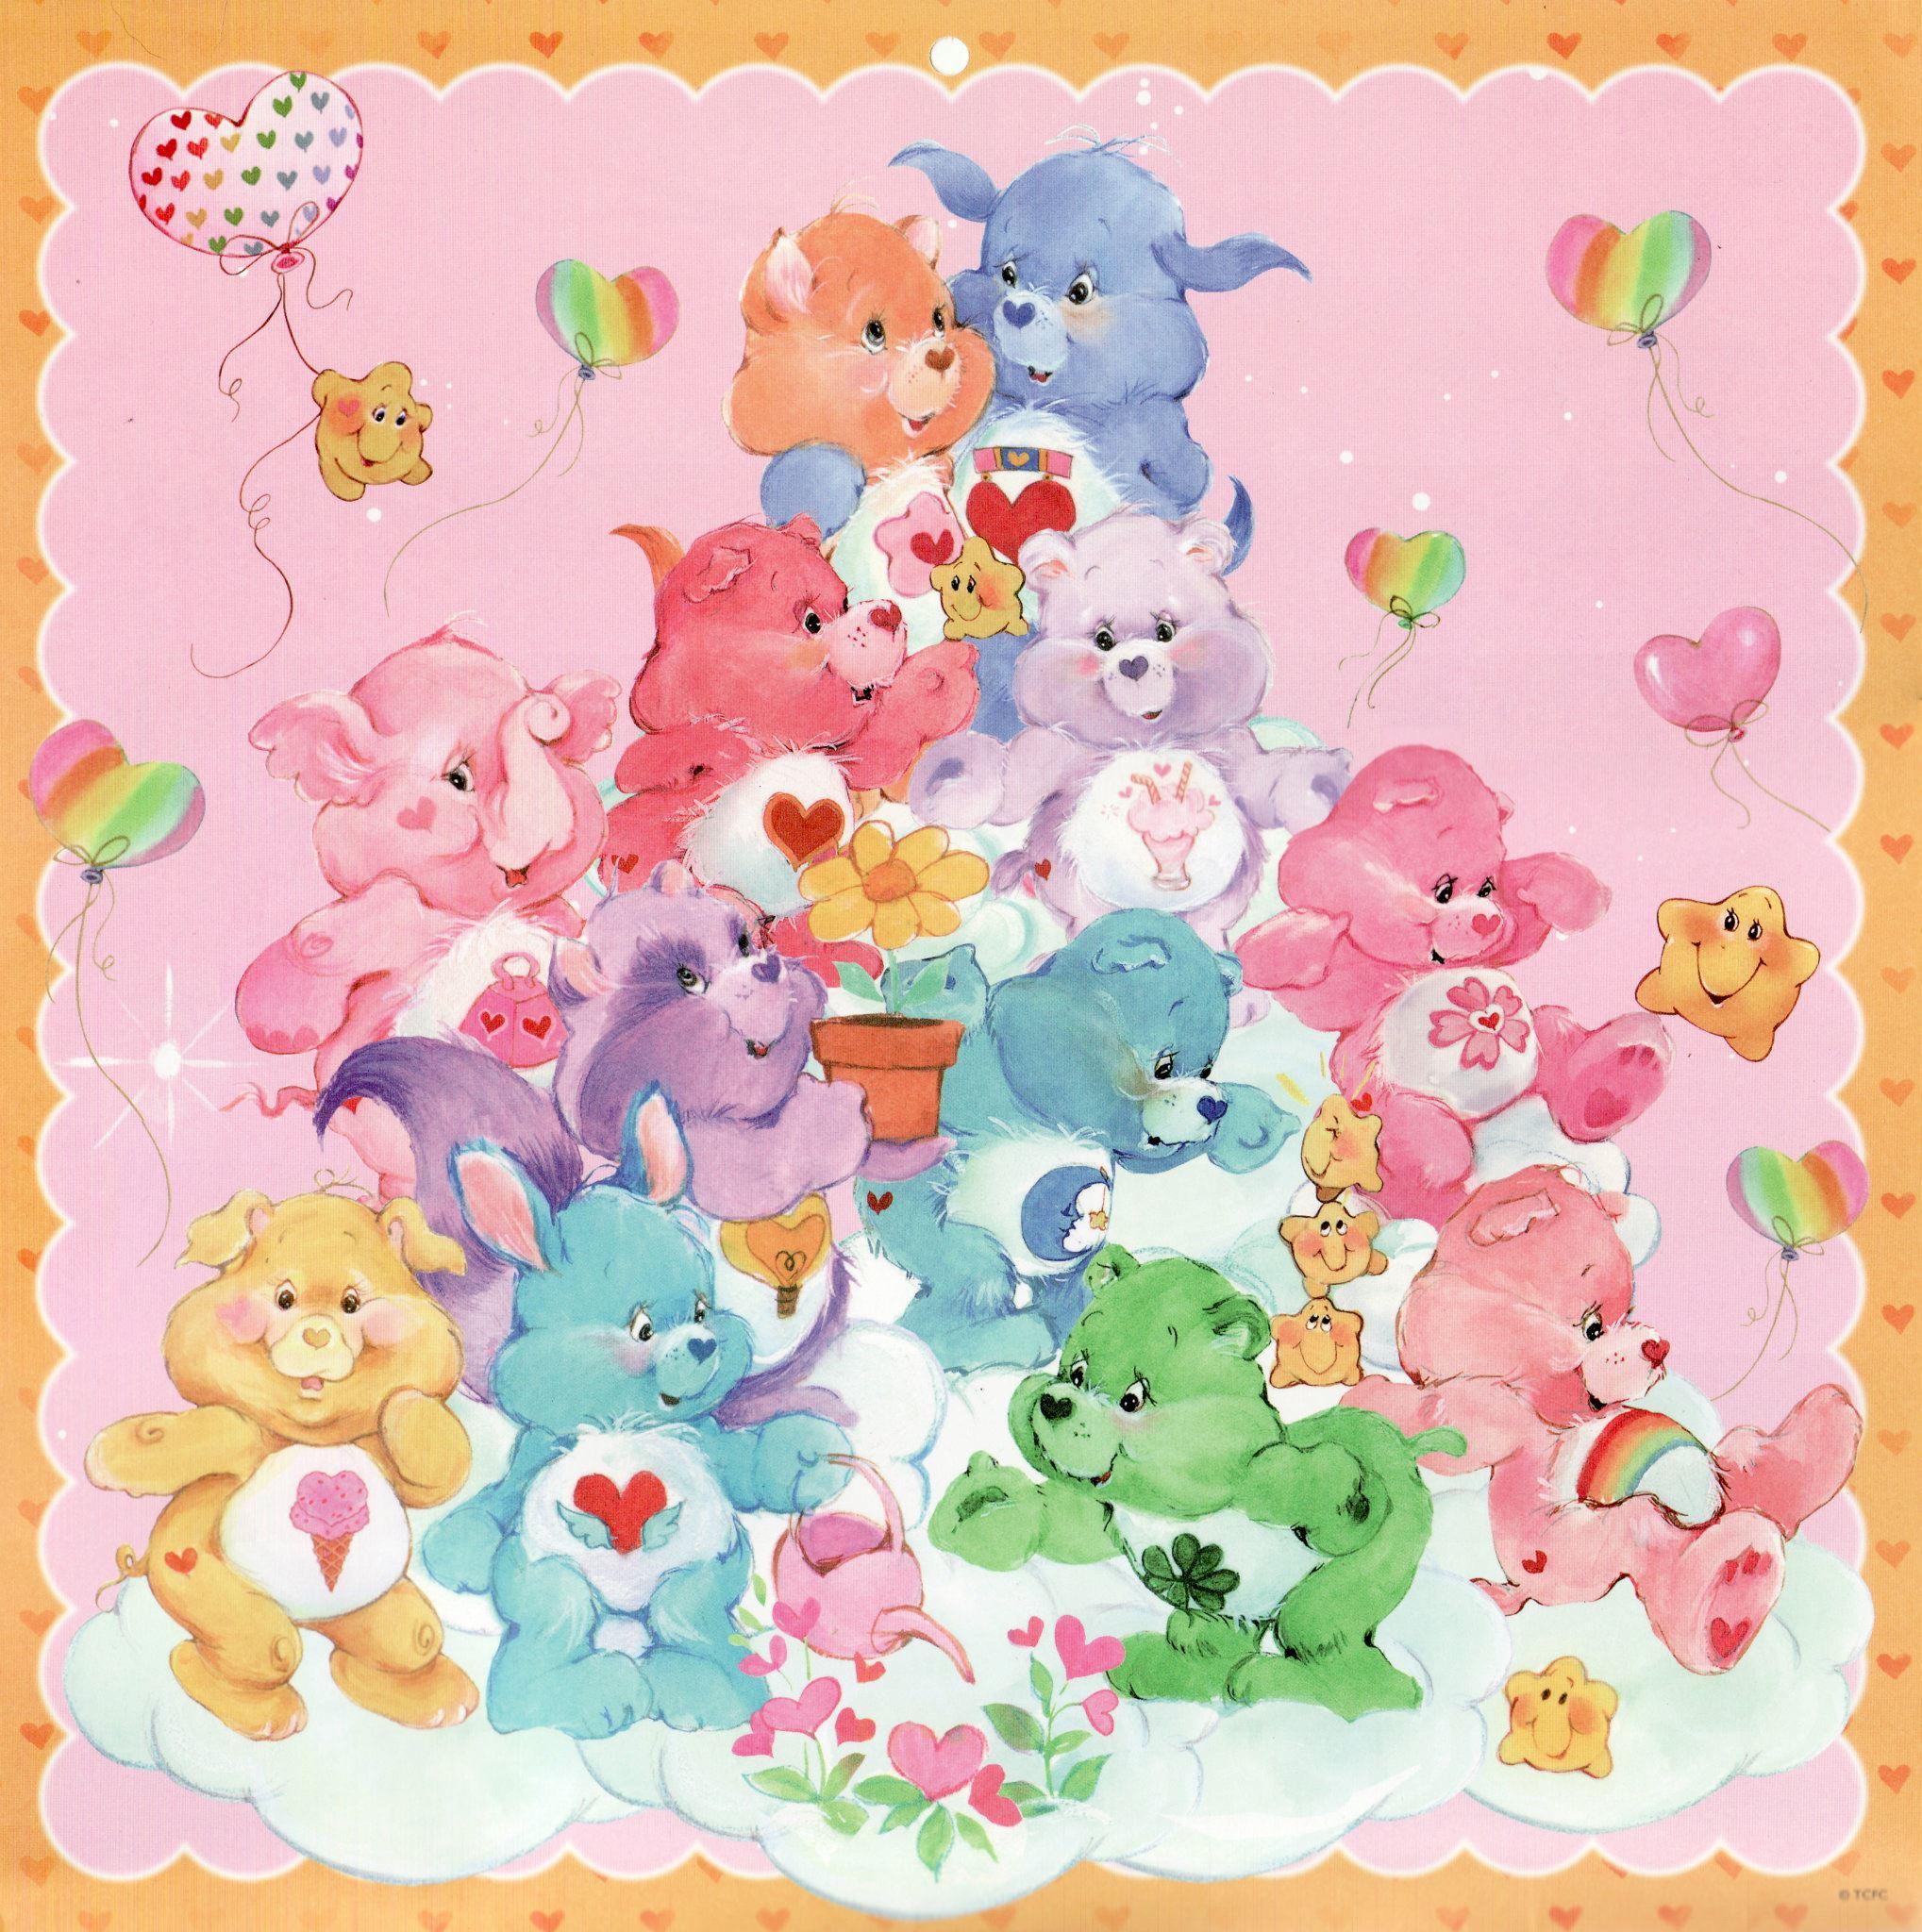 Care Bears Wallpaper: Care Bears Wallpaper